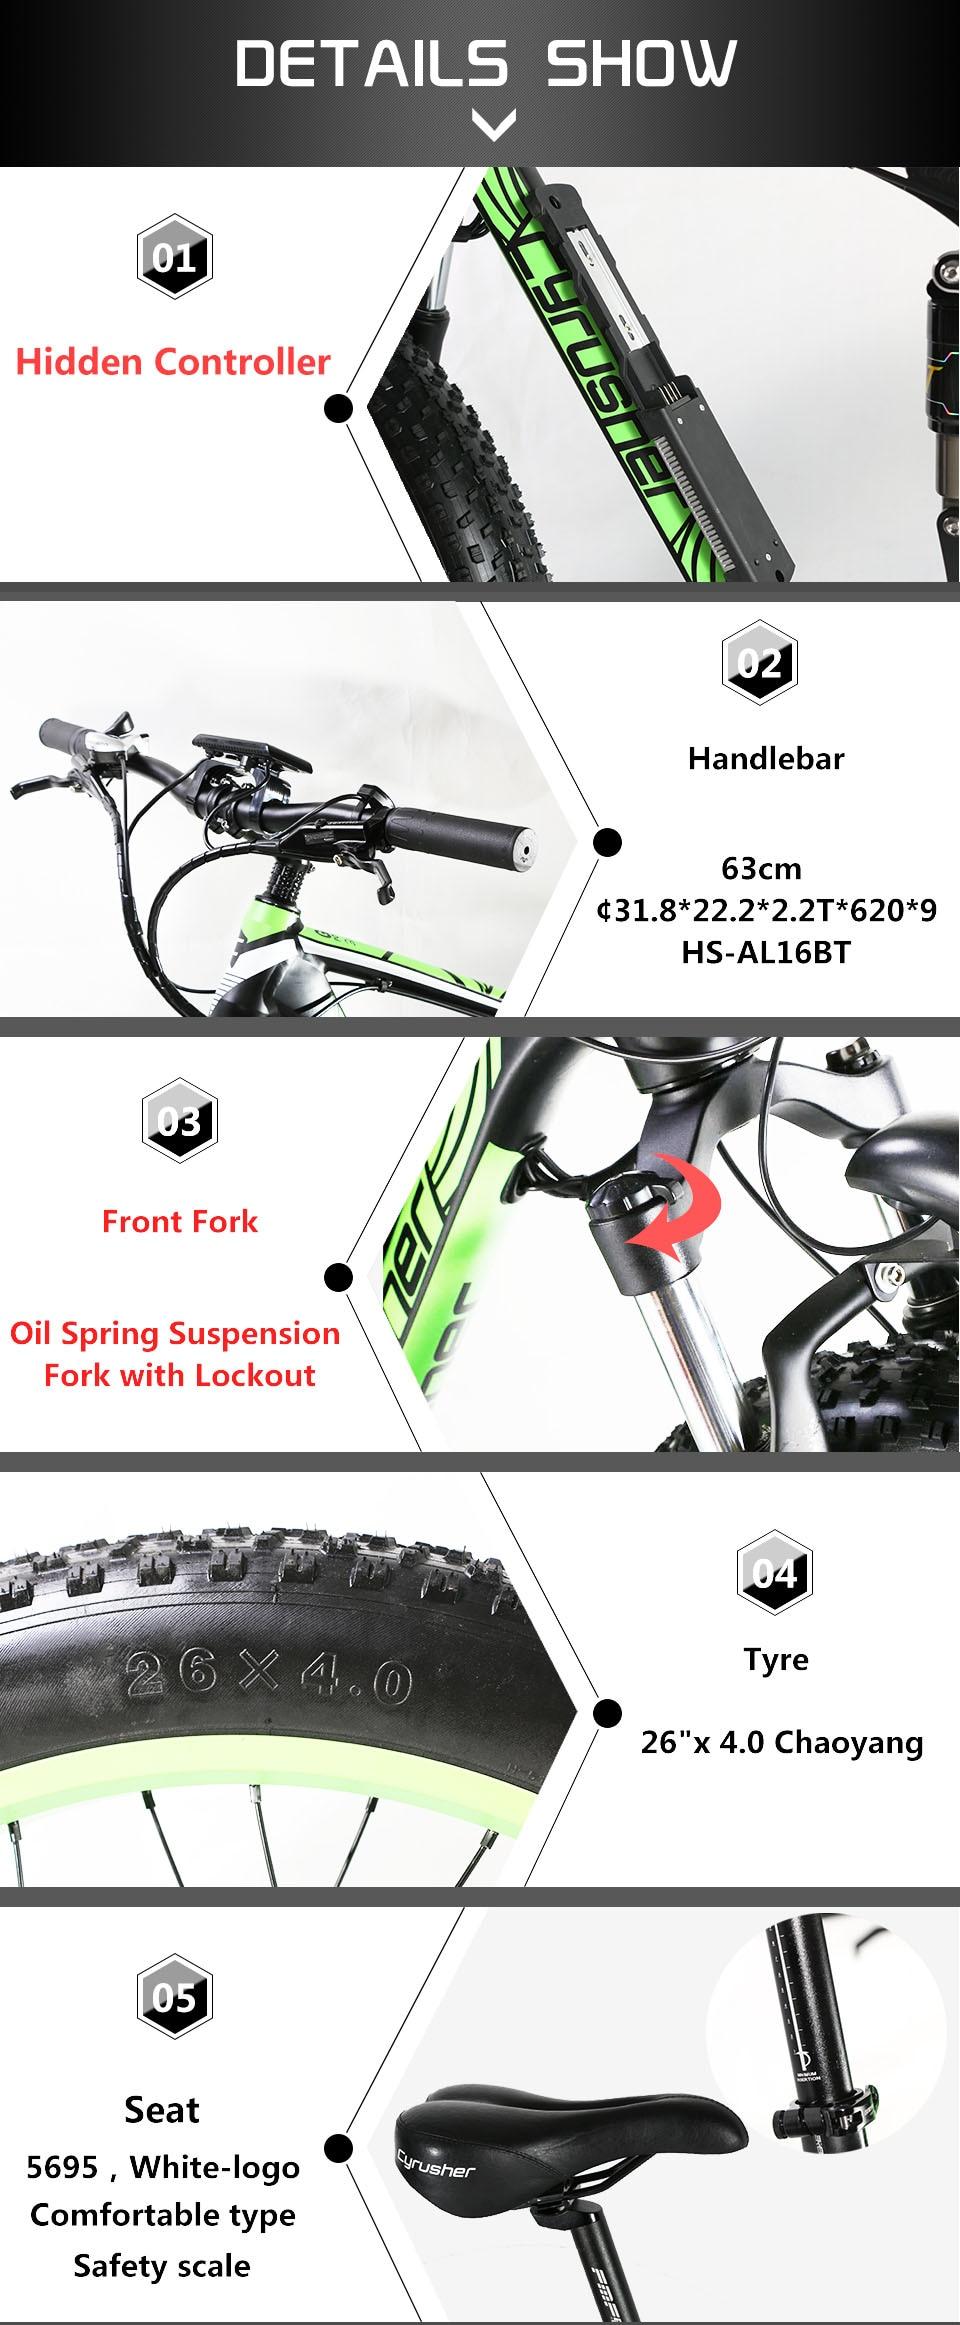 HTB1waMCM7voK1RjSZFDq6xY3pXap - Cyrusher XF800 1000W 48V Electrical Bike Full Suspension body 7 Speeds widewheel highway Bike out of doors sensible speedometer Ebike